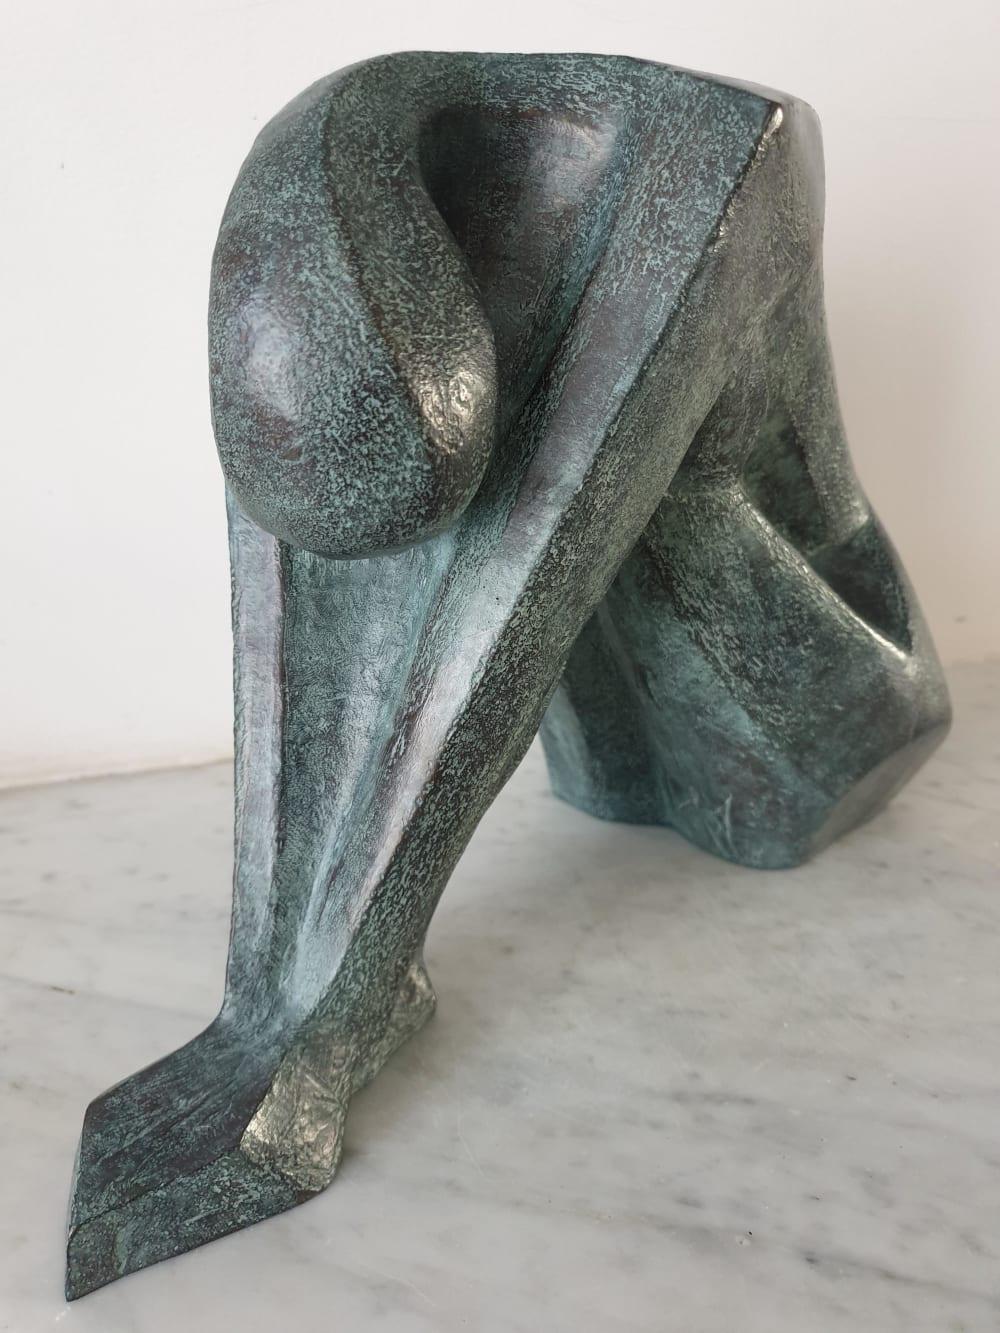 Voyelle - Lili Mirante